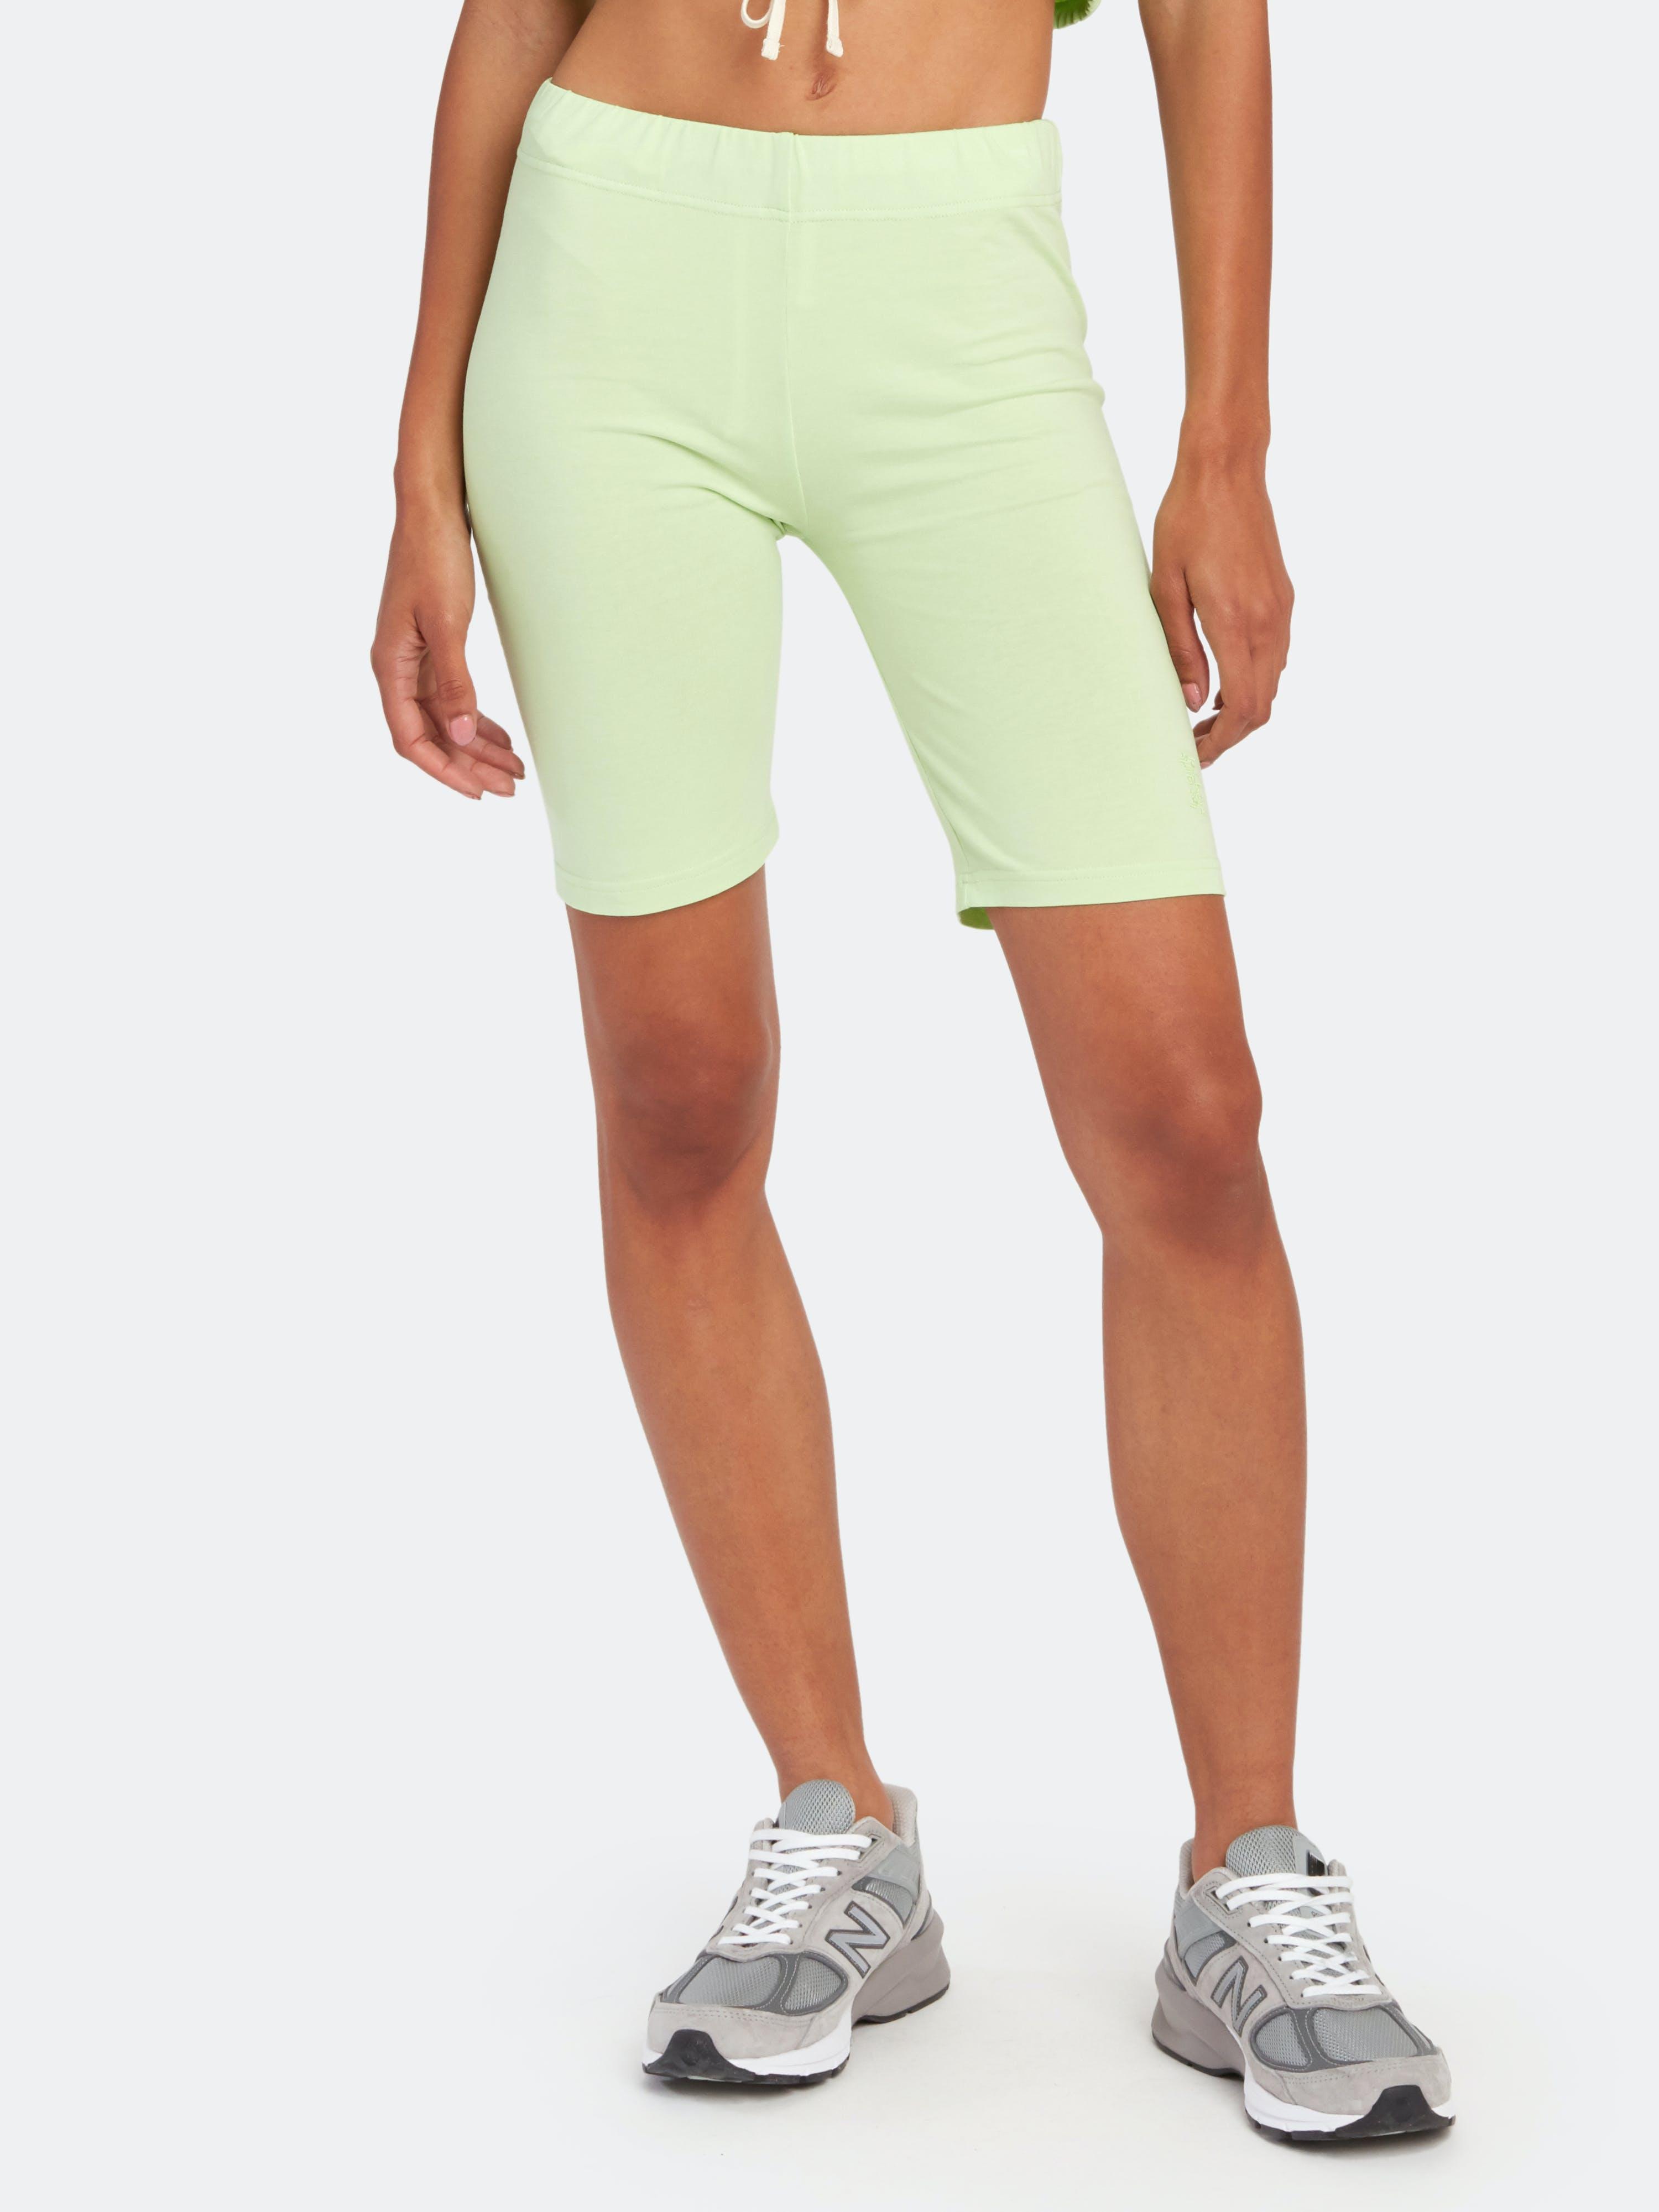 Les Girls Les Boys Tight Bike Shorts - L - Also in: M, XL, S, XS  - Green